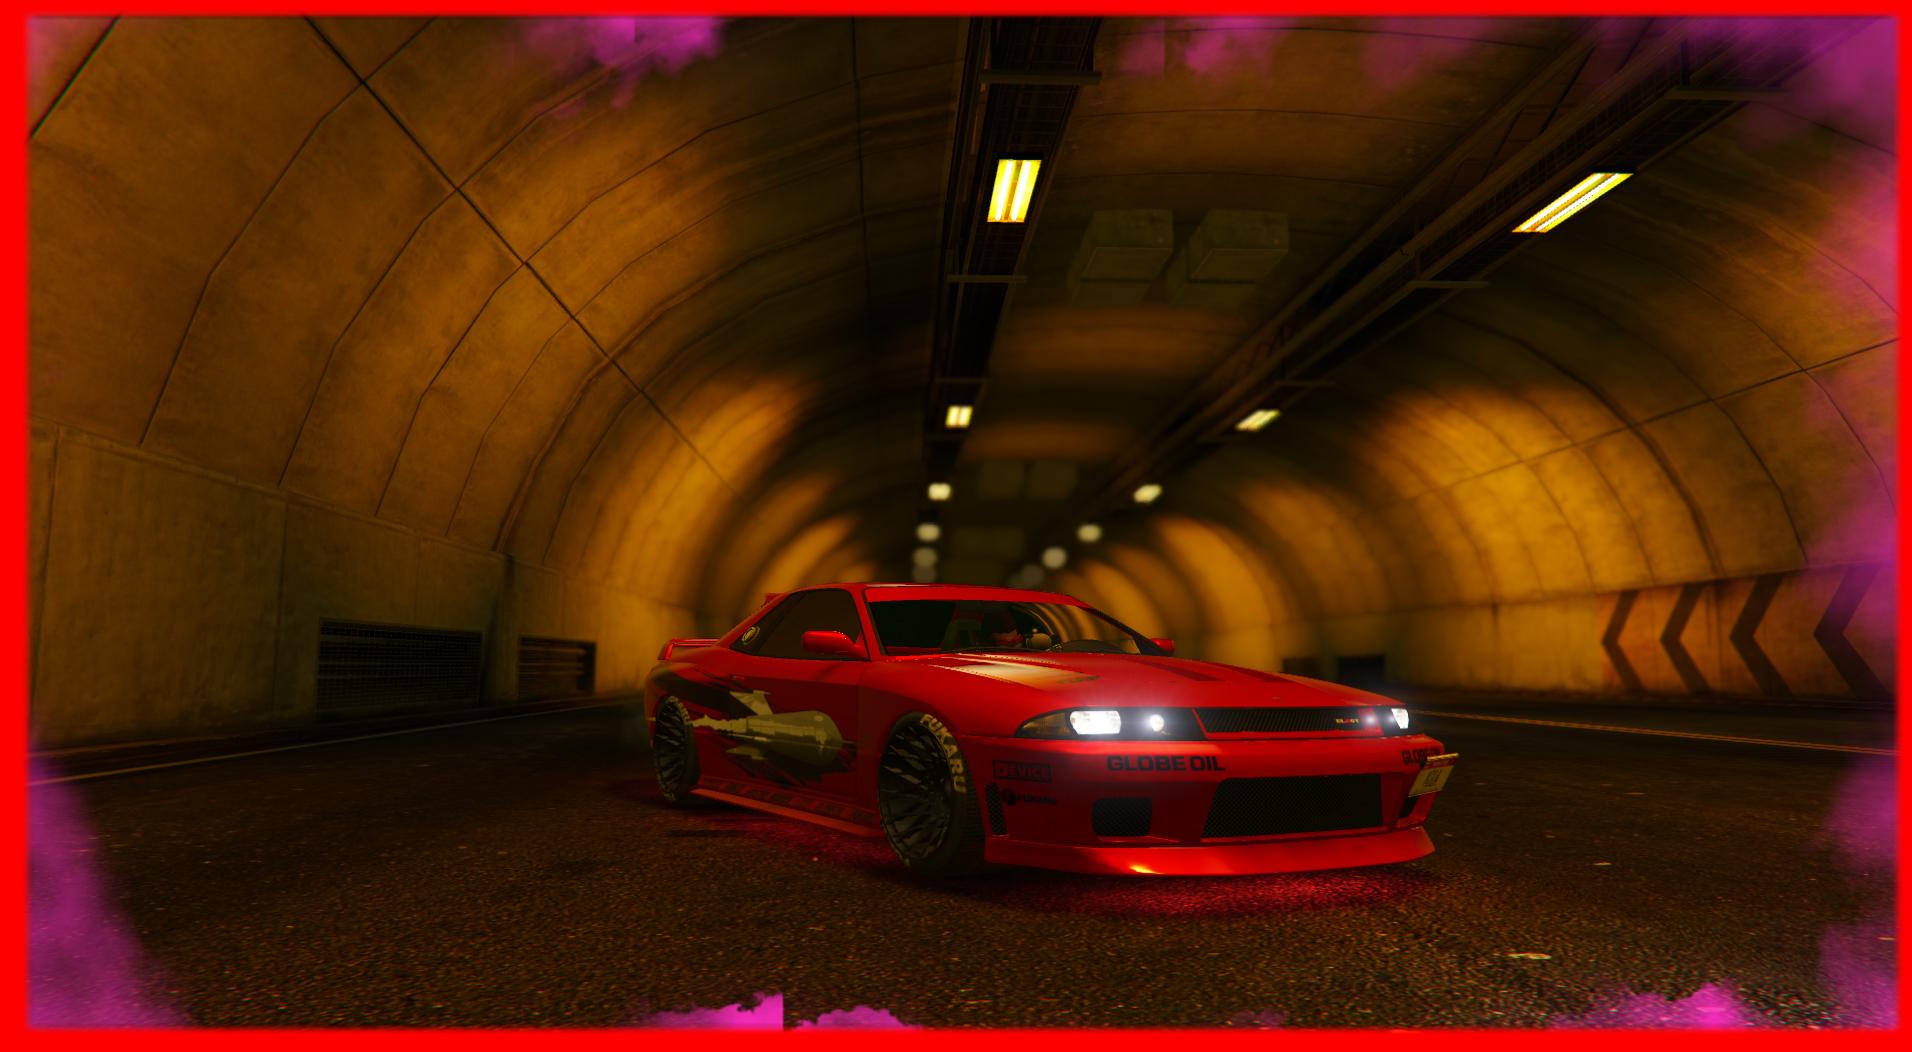 Grand_Theft_Auto_V_Screenshot_2021.02.26_-_19.42.jpg